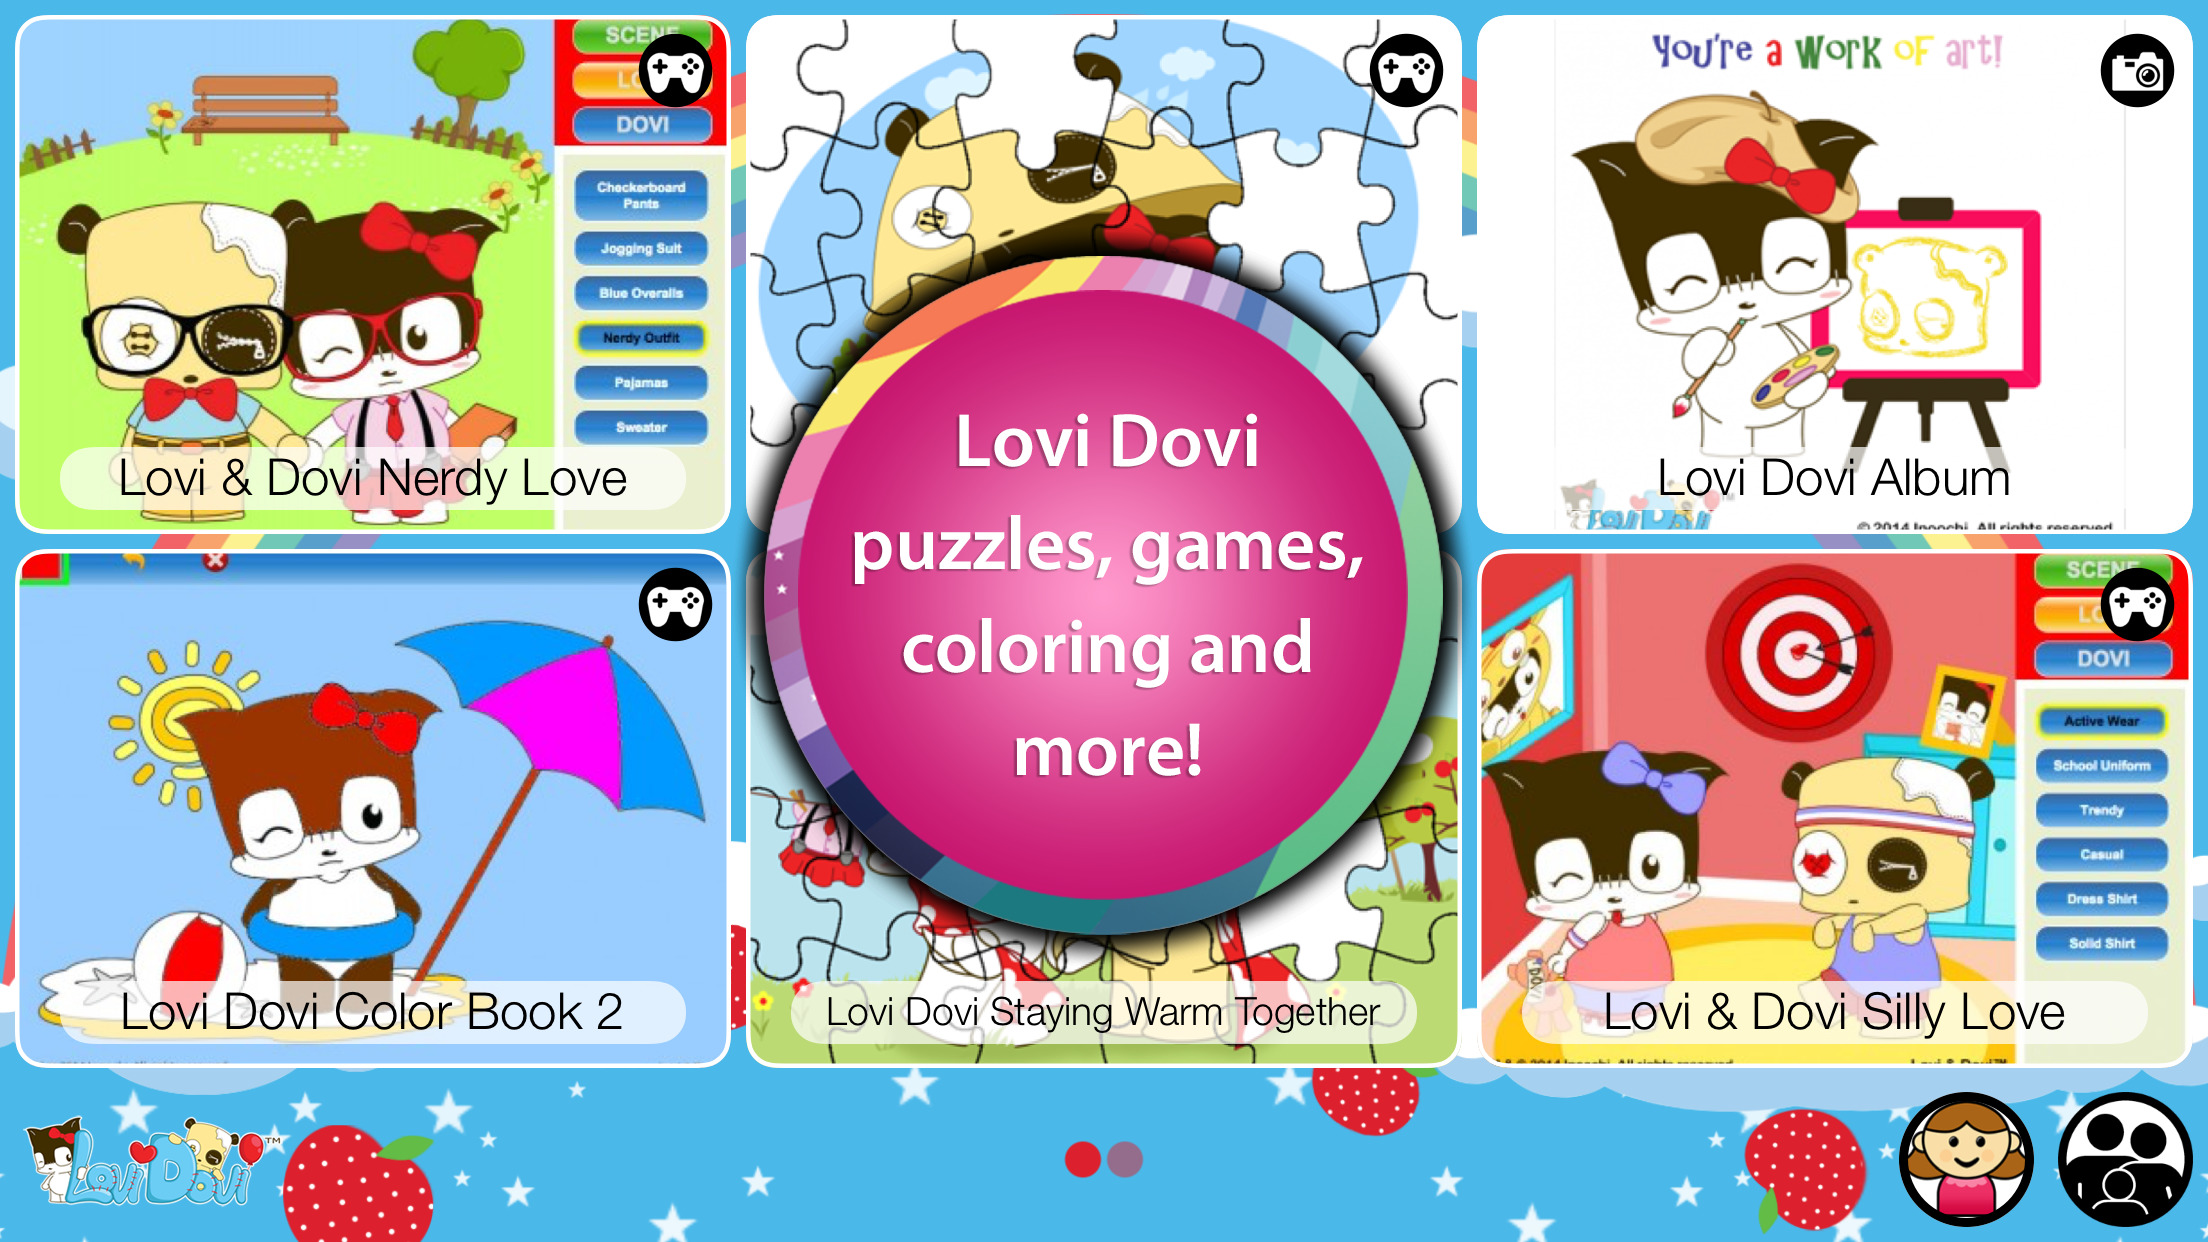 Lovi Dovi - Cute Love and Happiness by Inoochi